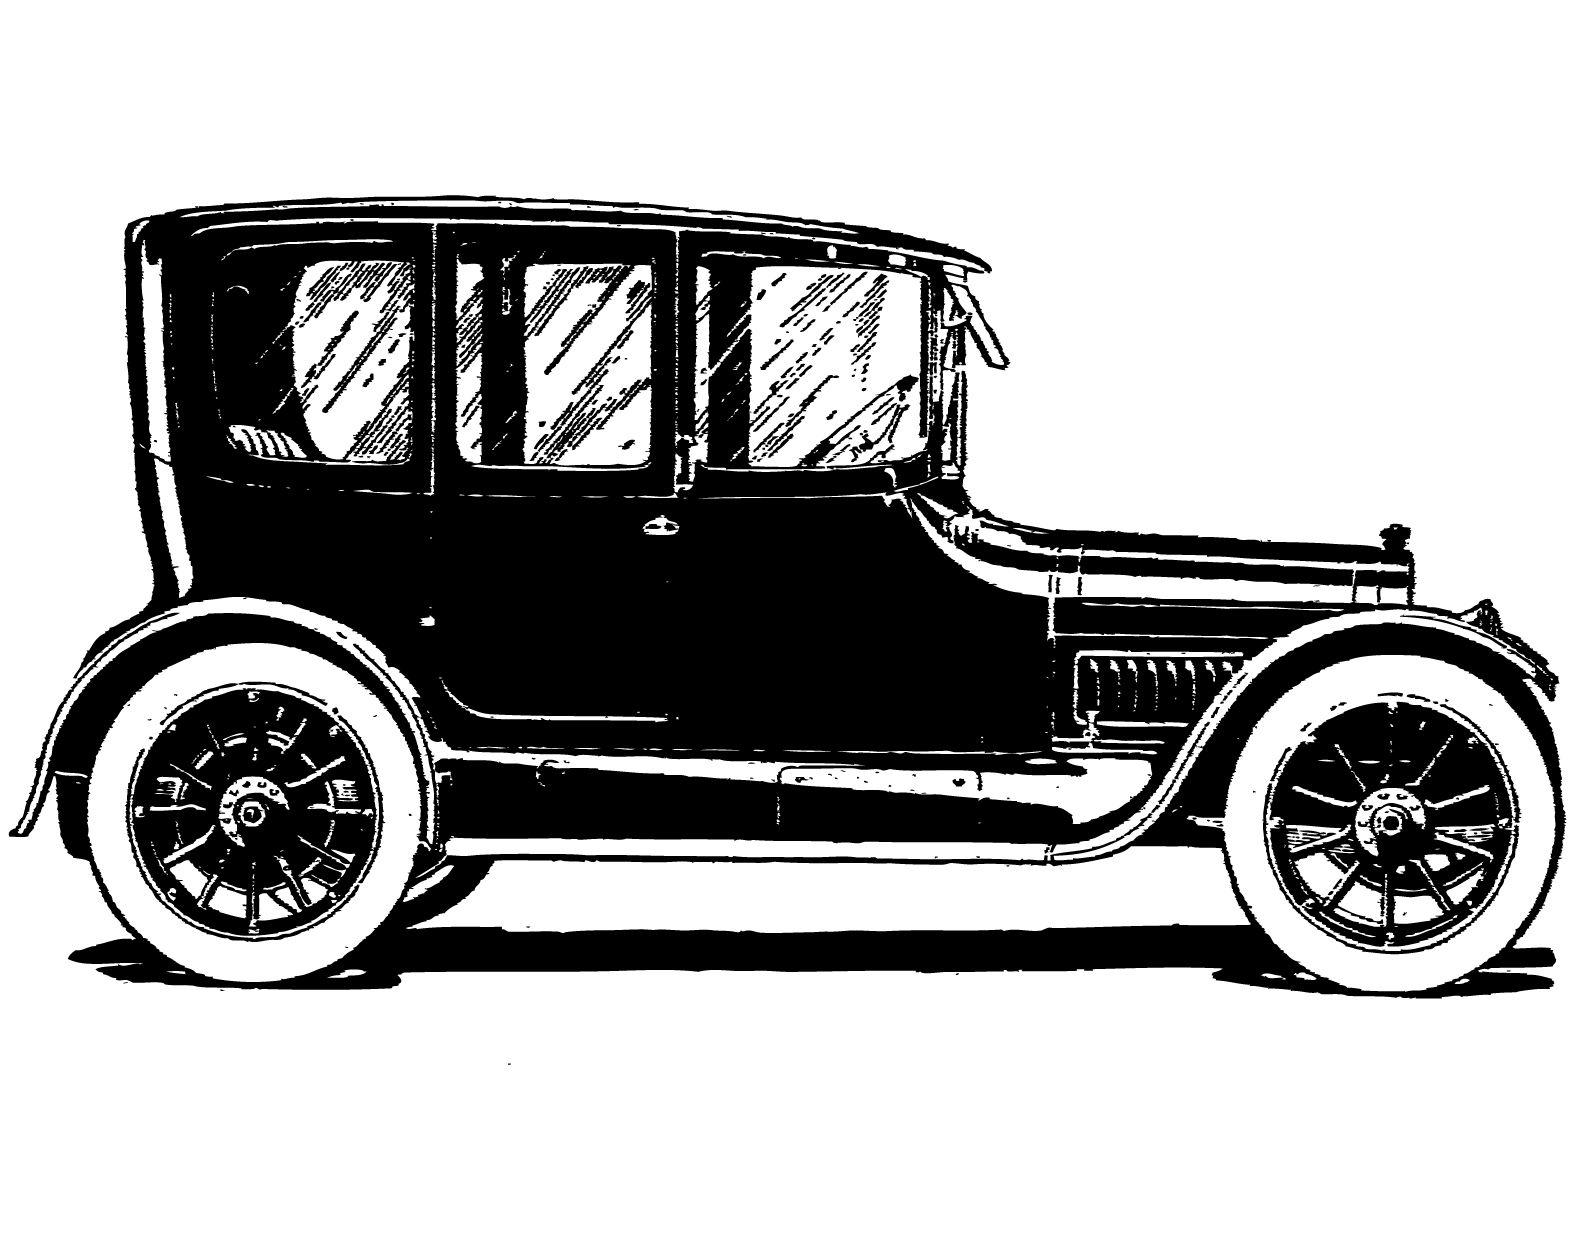 Free Vintage Clip Art Images: Vintage Ca-Free vintage clip art images: Vintage cars and coaches clip art-6